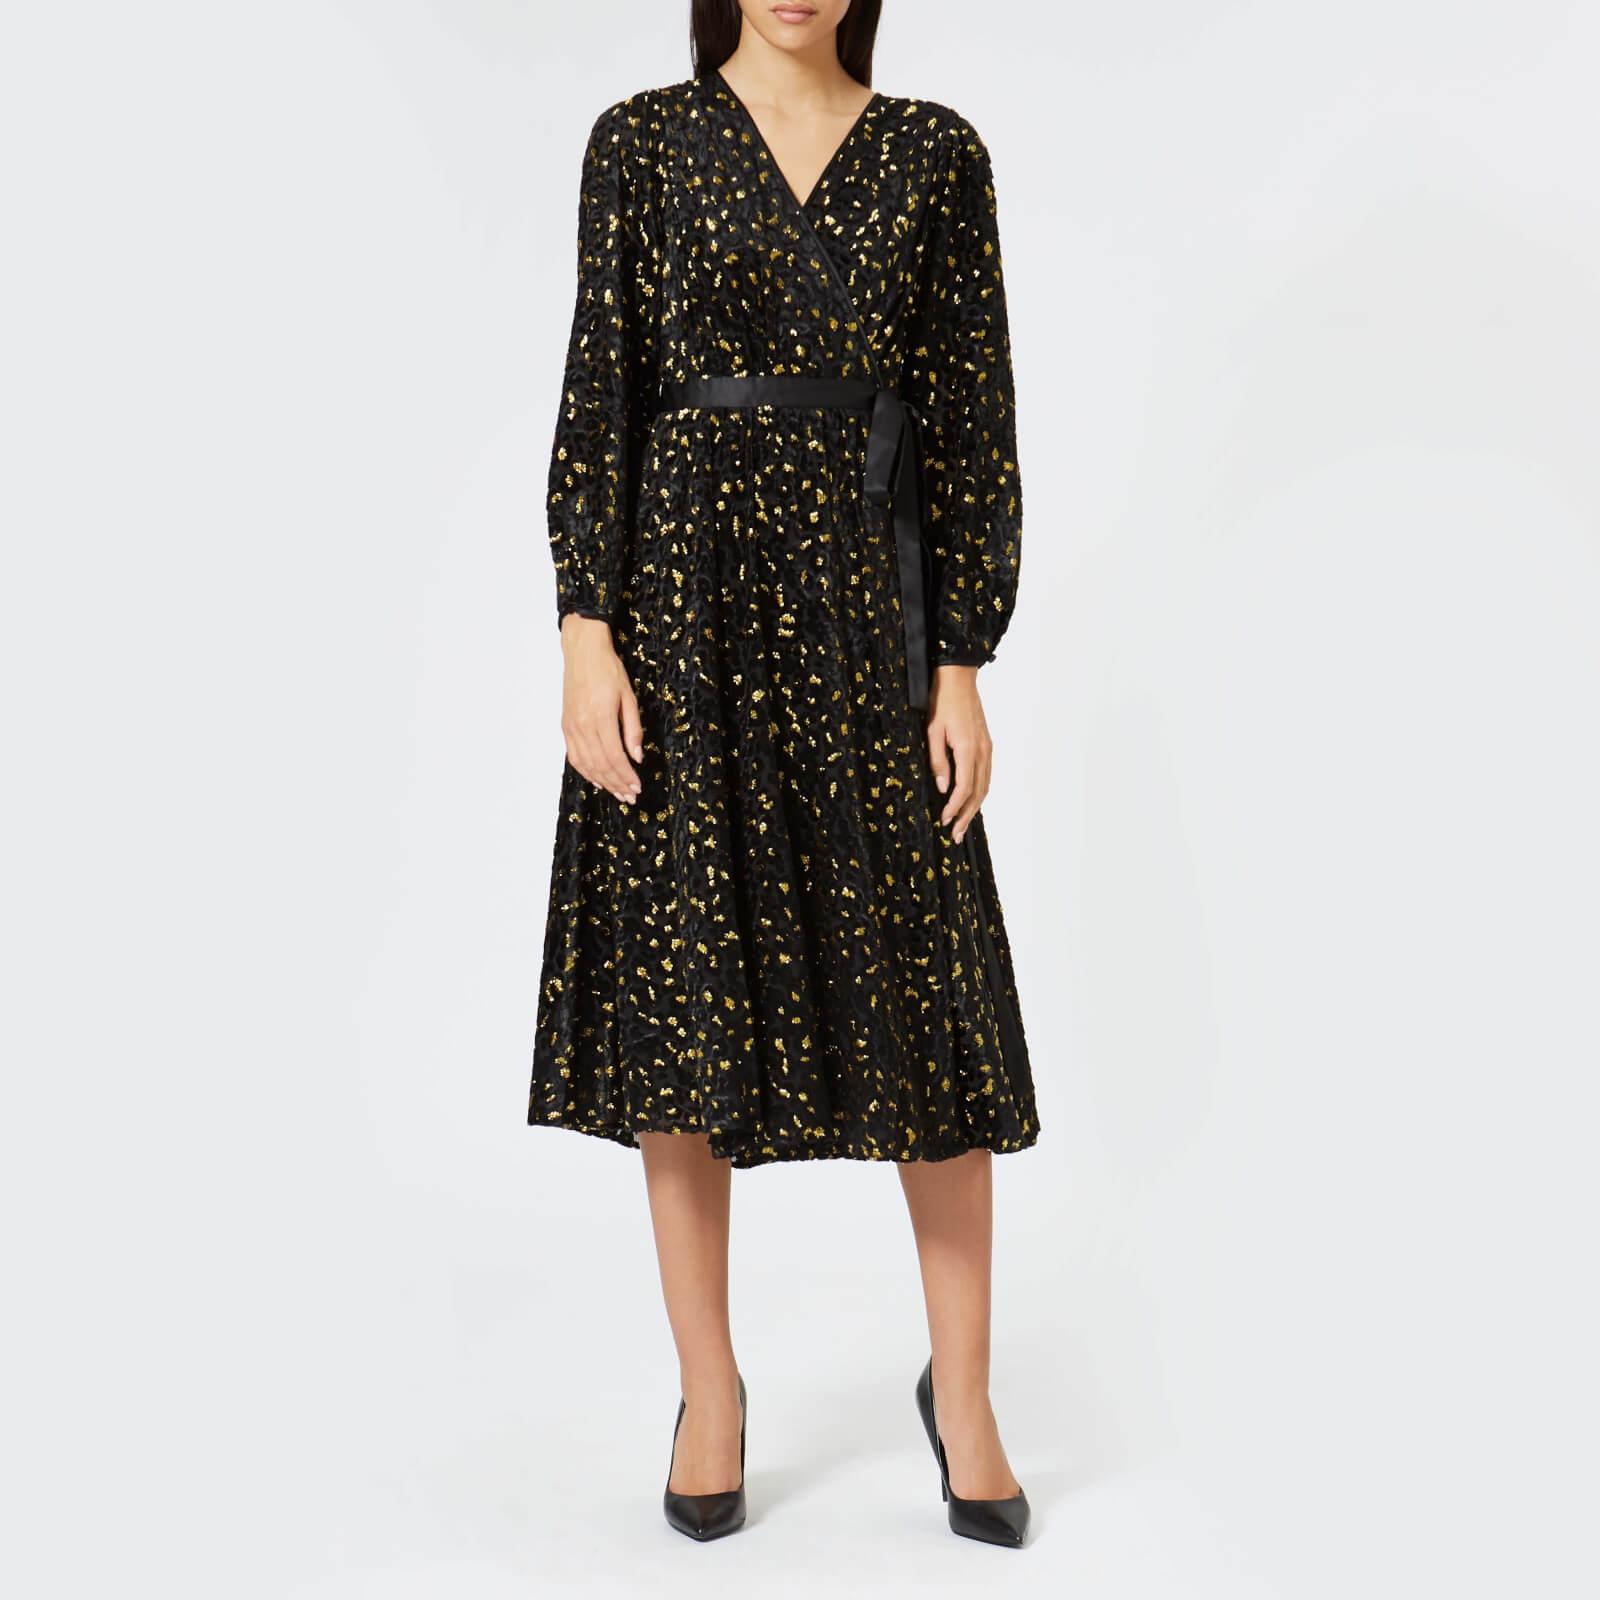 3a54dbc0e5ef3 Diane von Furstenberg Women's Animal Devore Wrap Dress - Black/Gold - Free  UK Delivery over £50